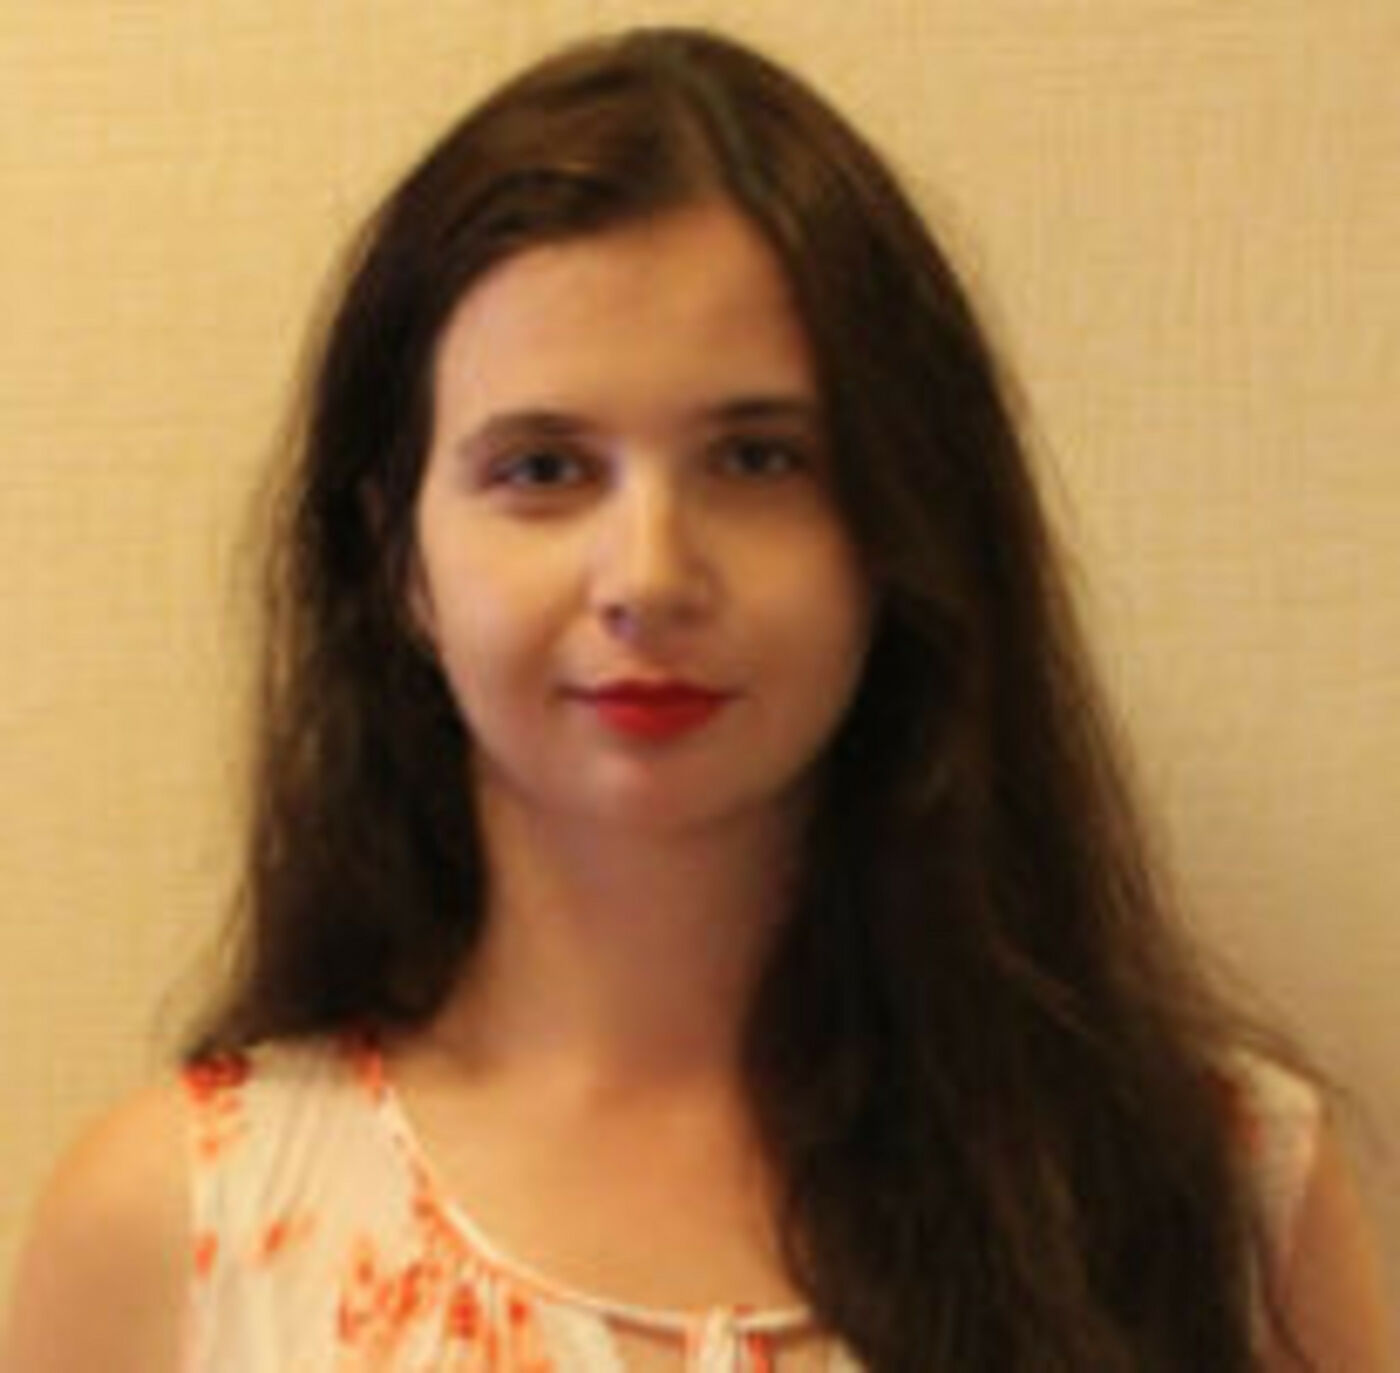 Zhuravleva Виктория Владимировна